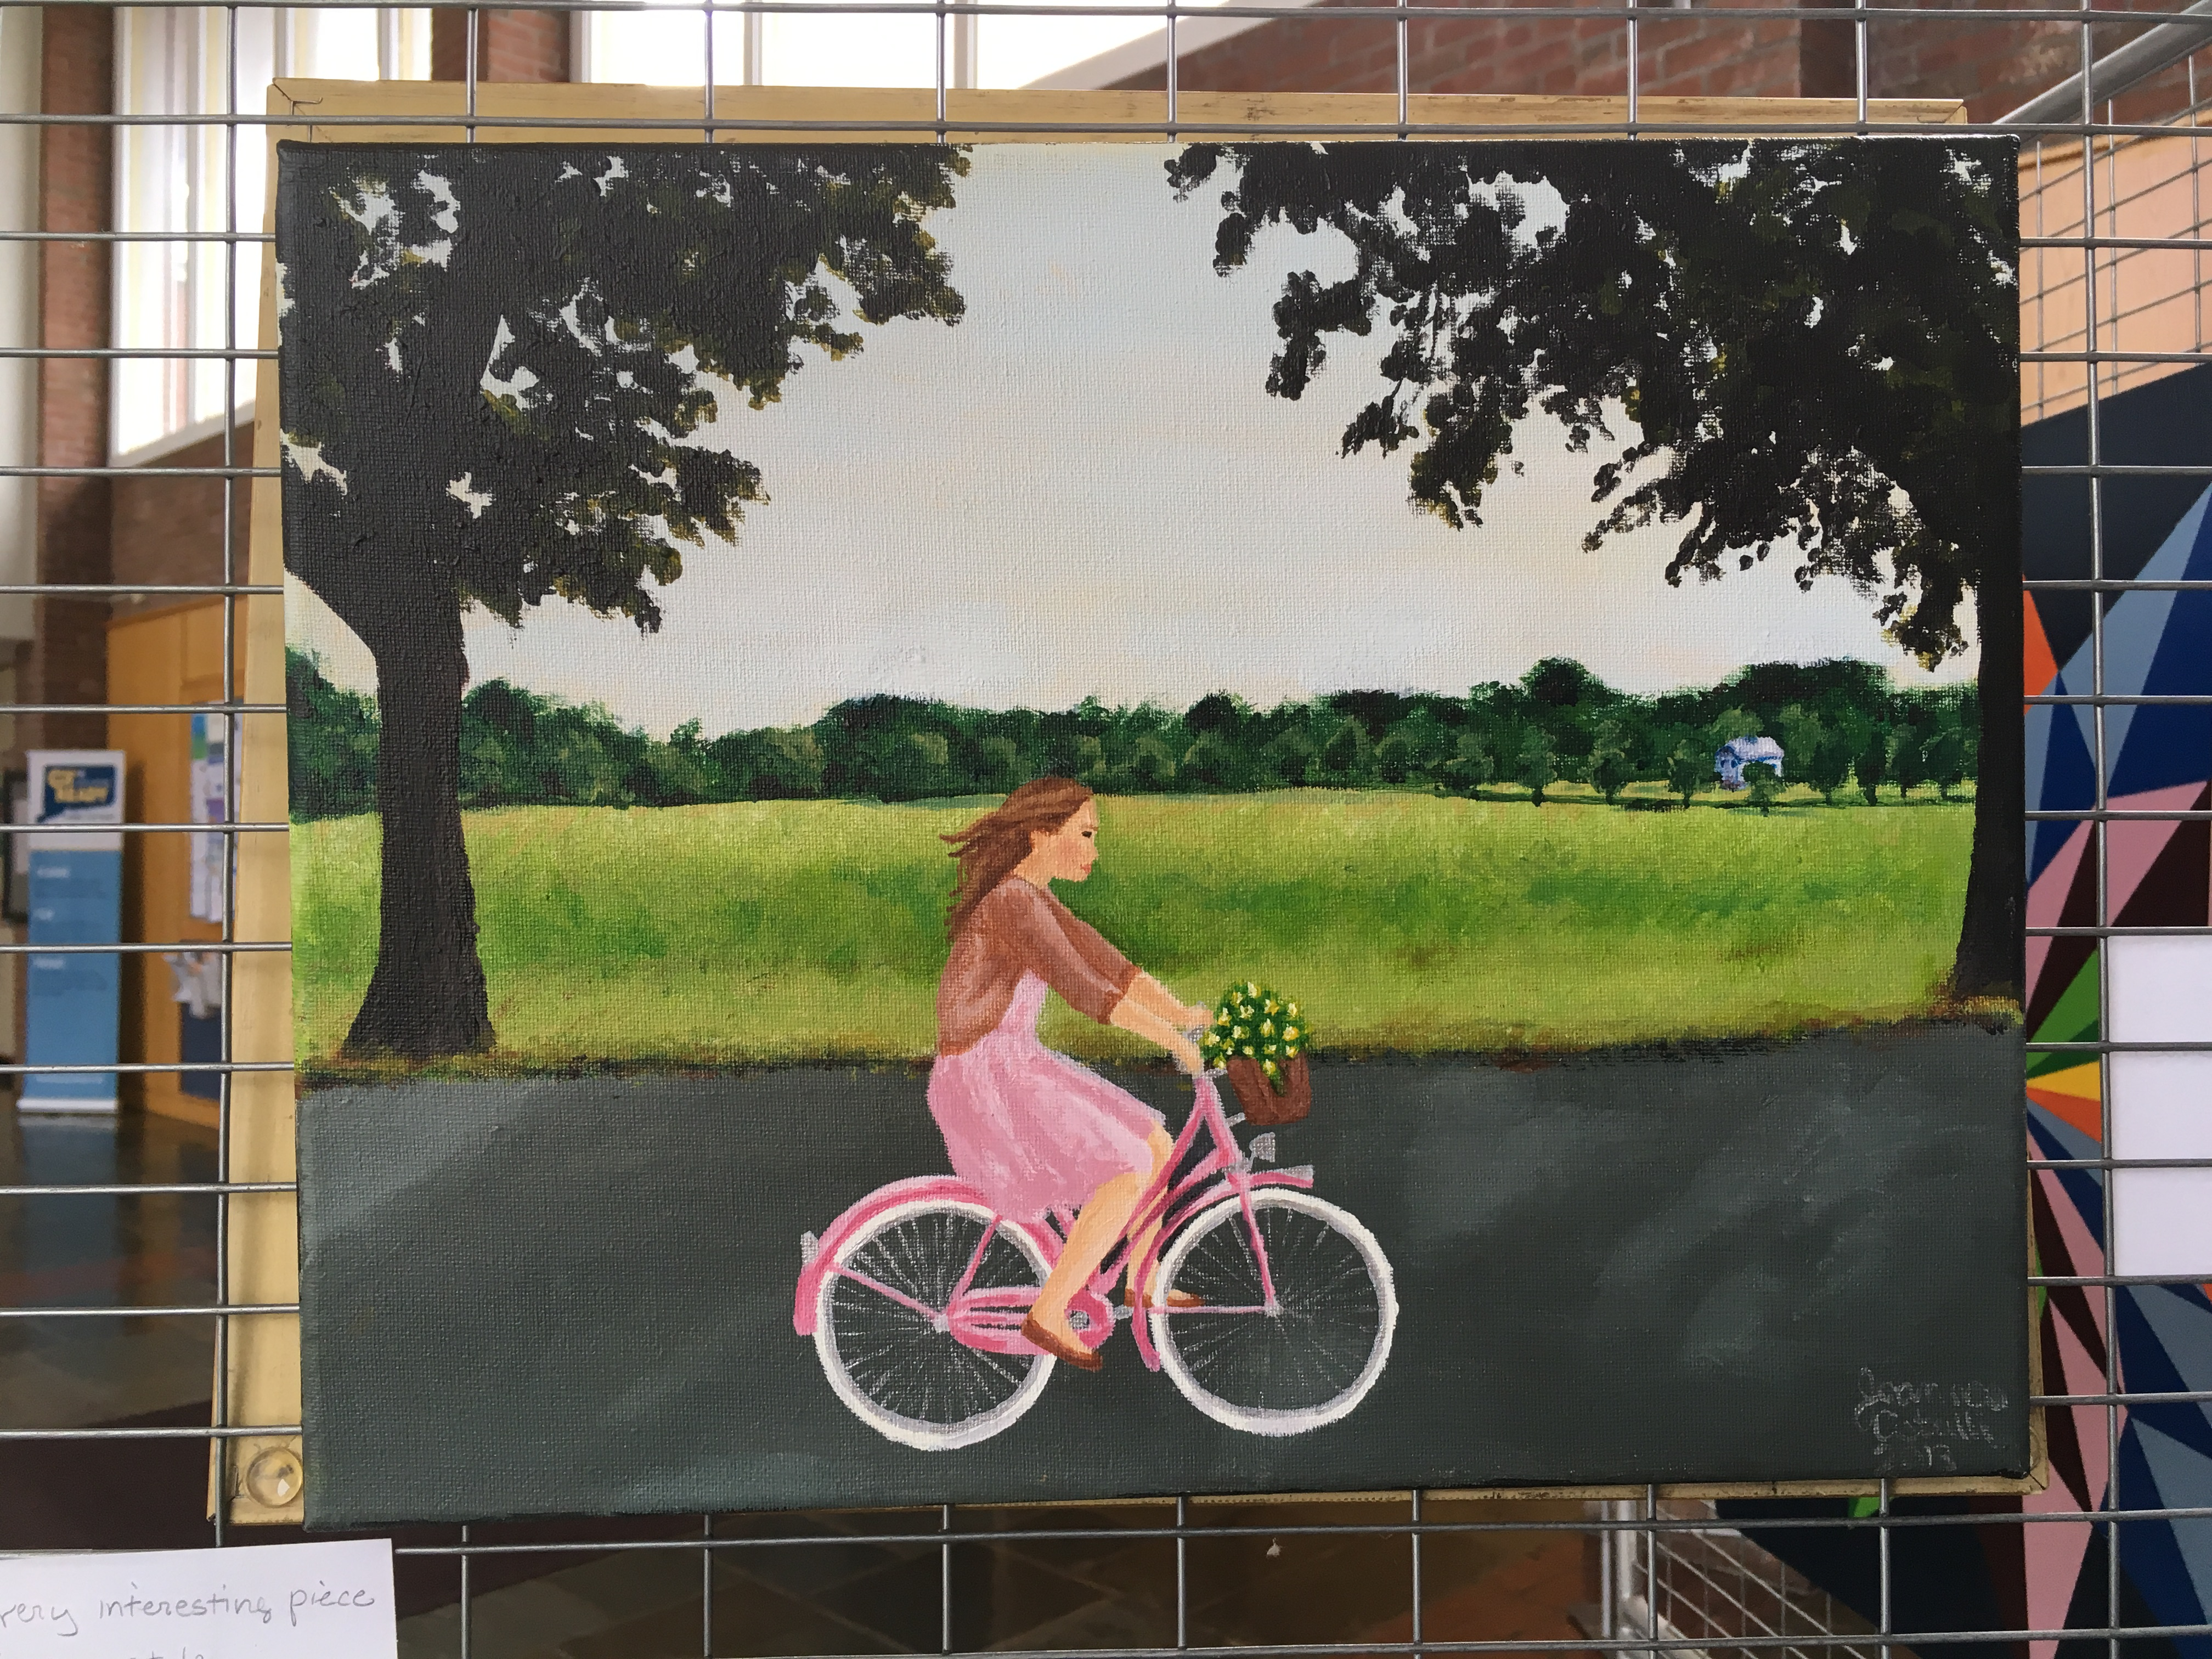 Bike Ride - Joanna Cistulli